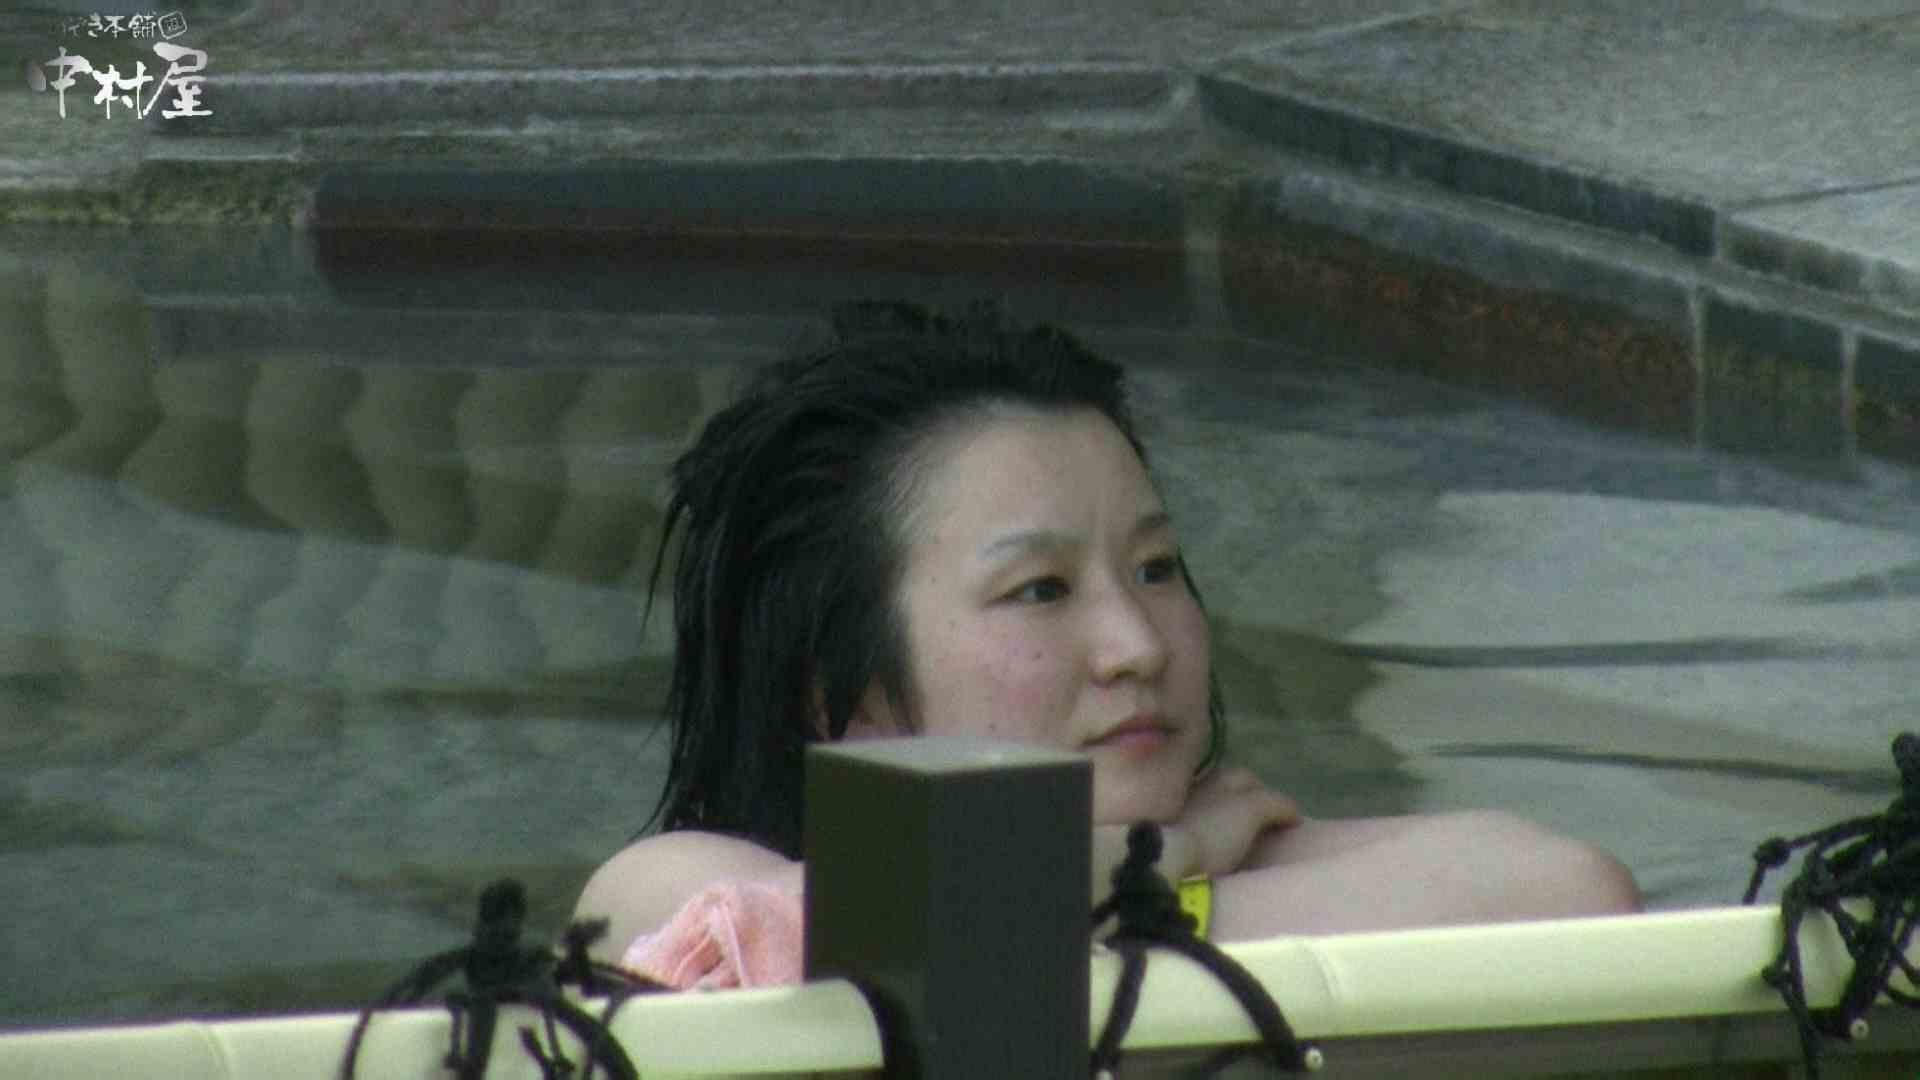 Aquaな露天風呂Vol.982 露天風呂編   盗撮シリーズ  78PIX 65